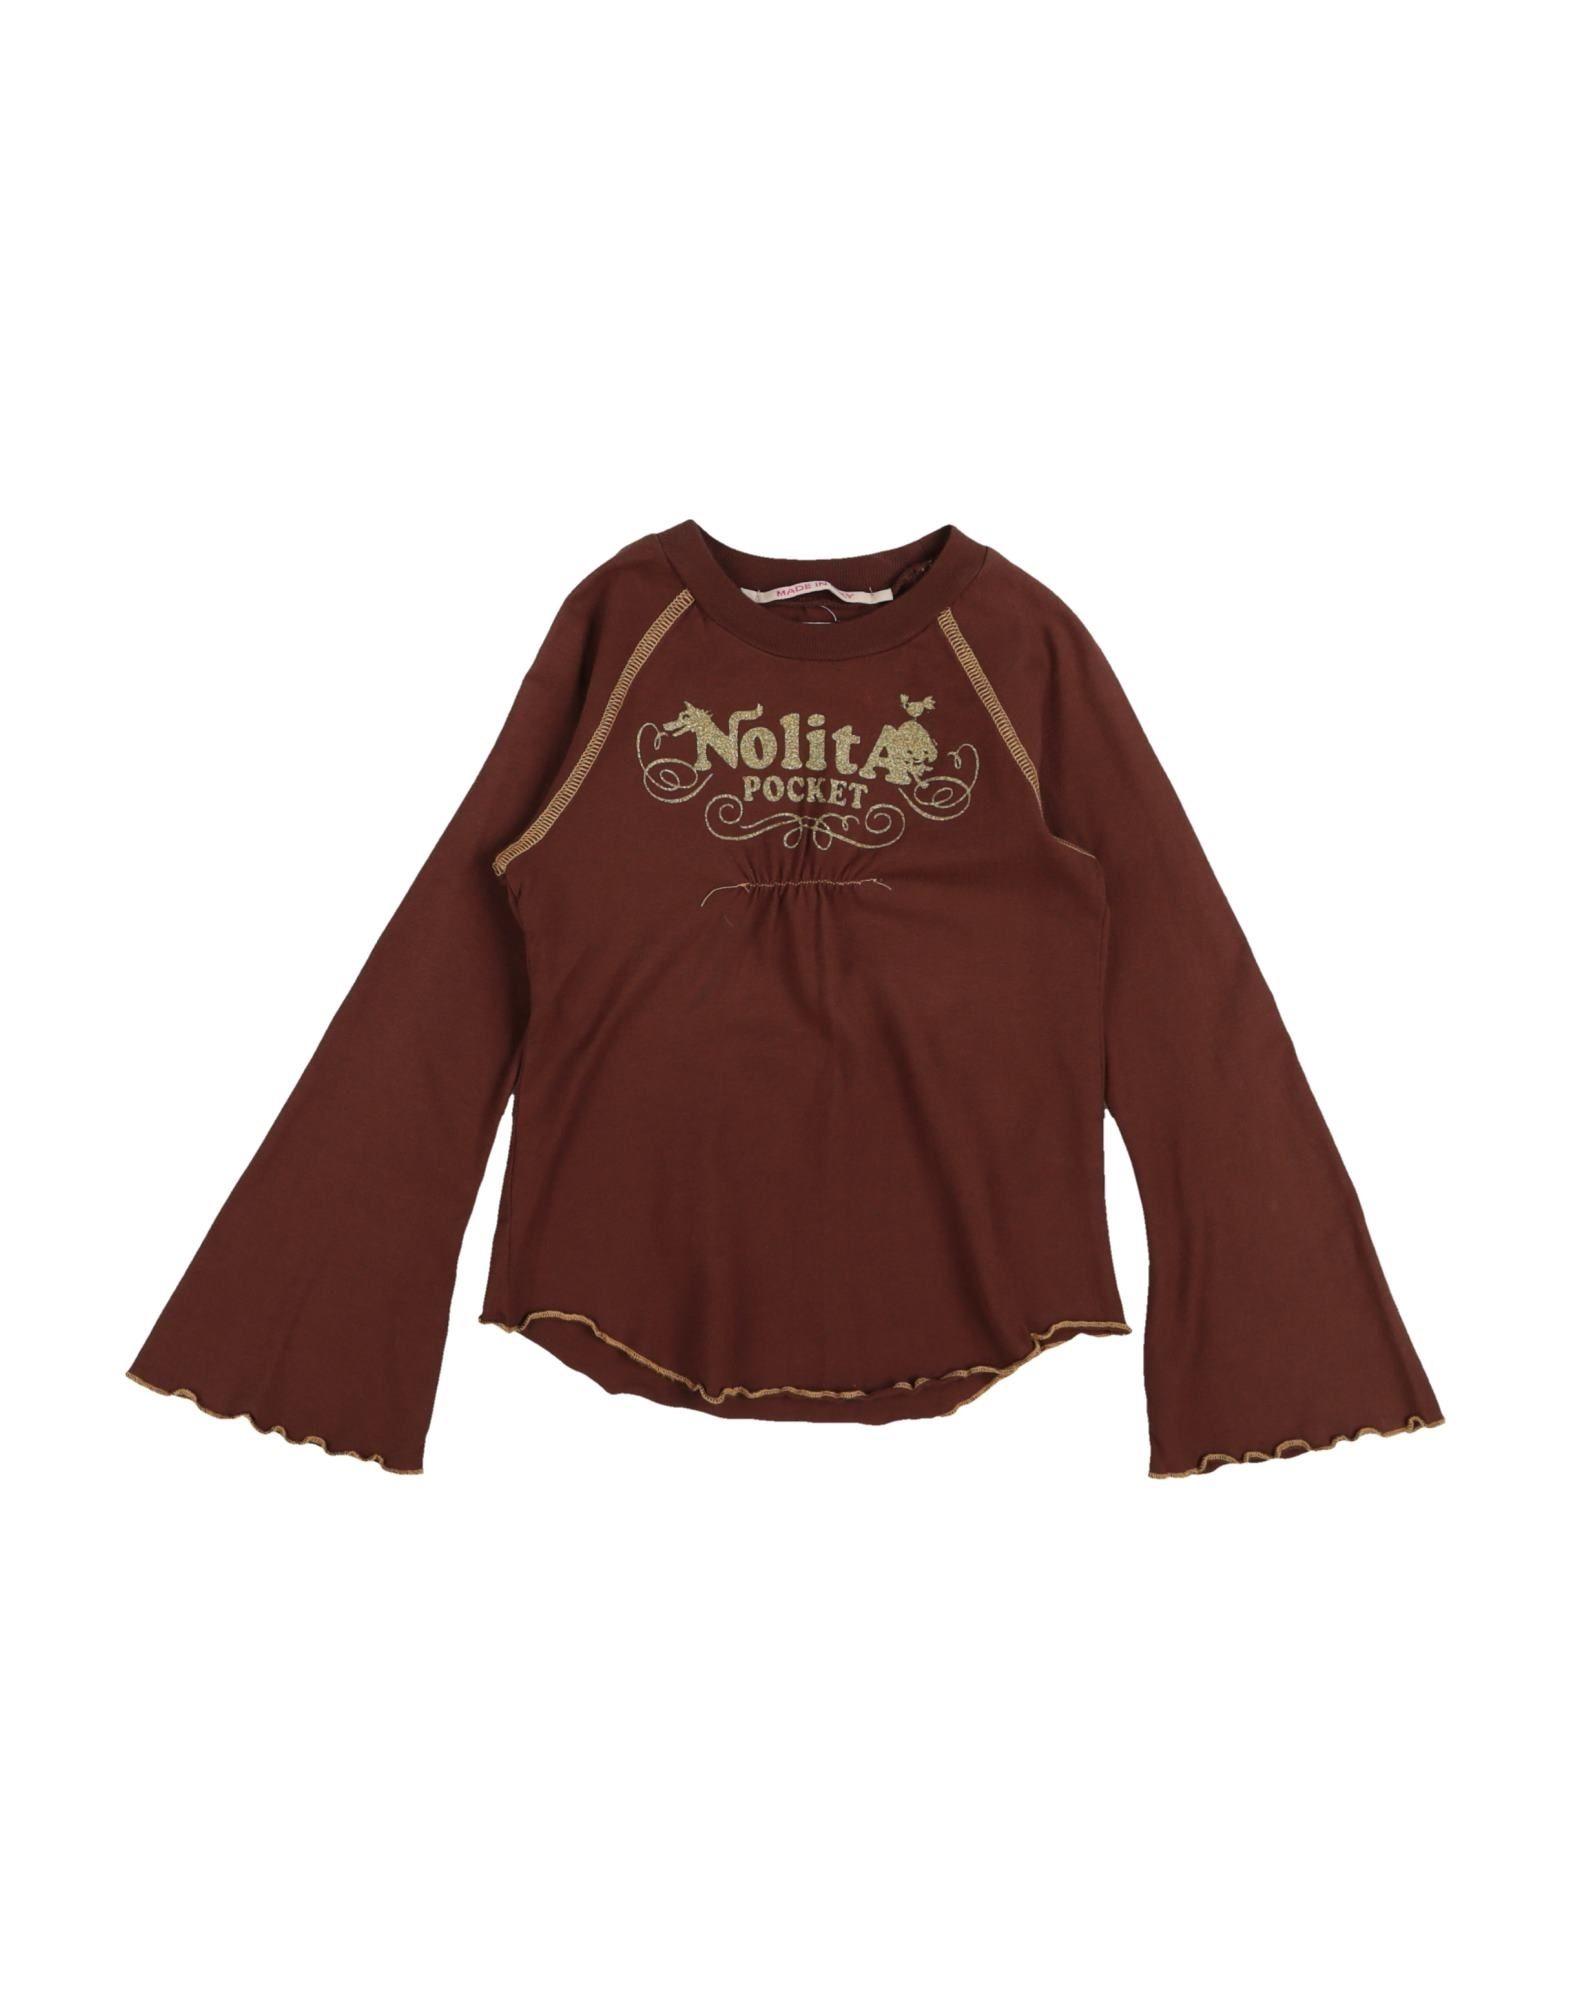 Nolita Pocket Kids' T-shirts In Brown